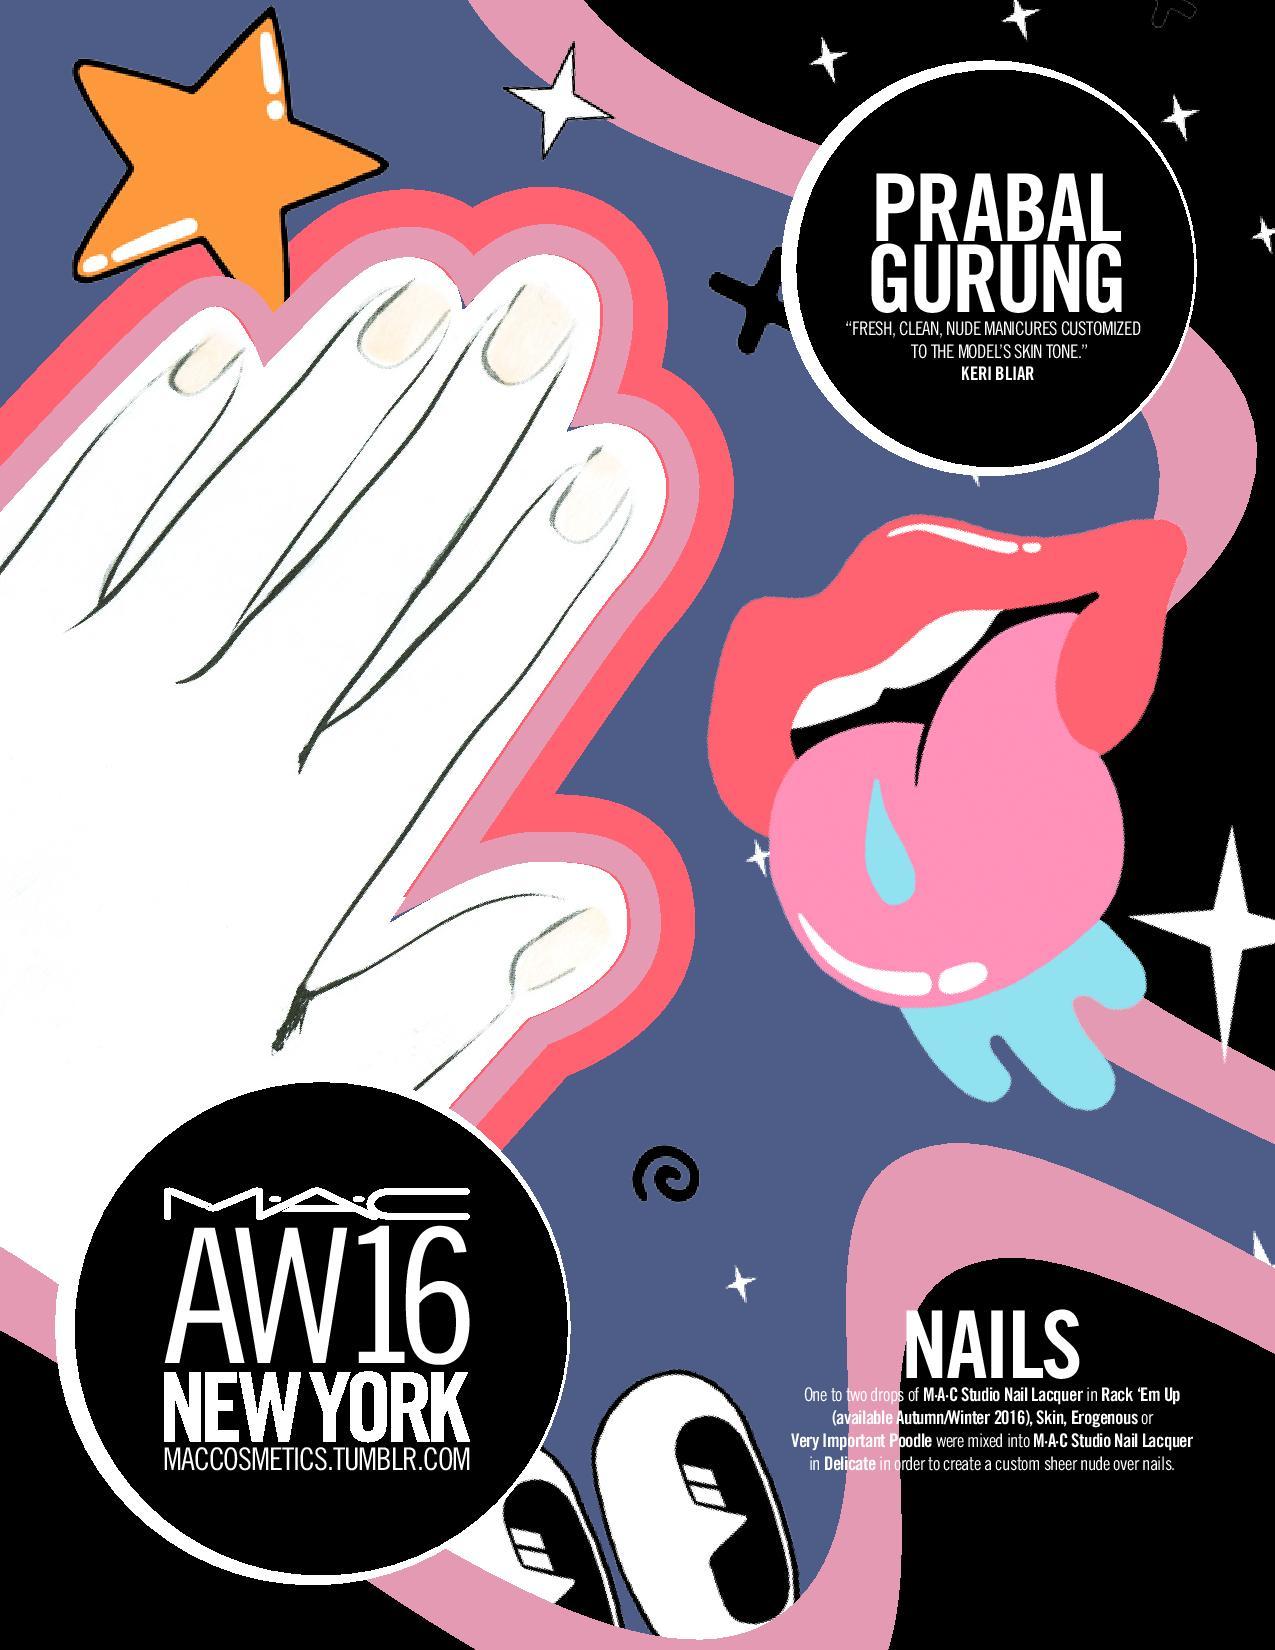 AW16_DAILY FACECHART_NEW YORK_FEB 14 HOOD BY AIR, PRABAL GURUNG)-page-004